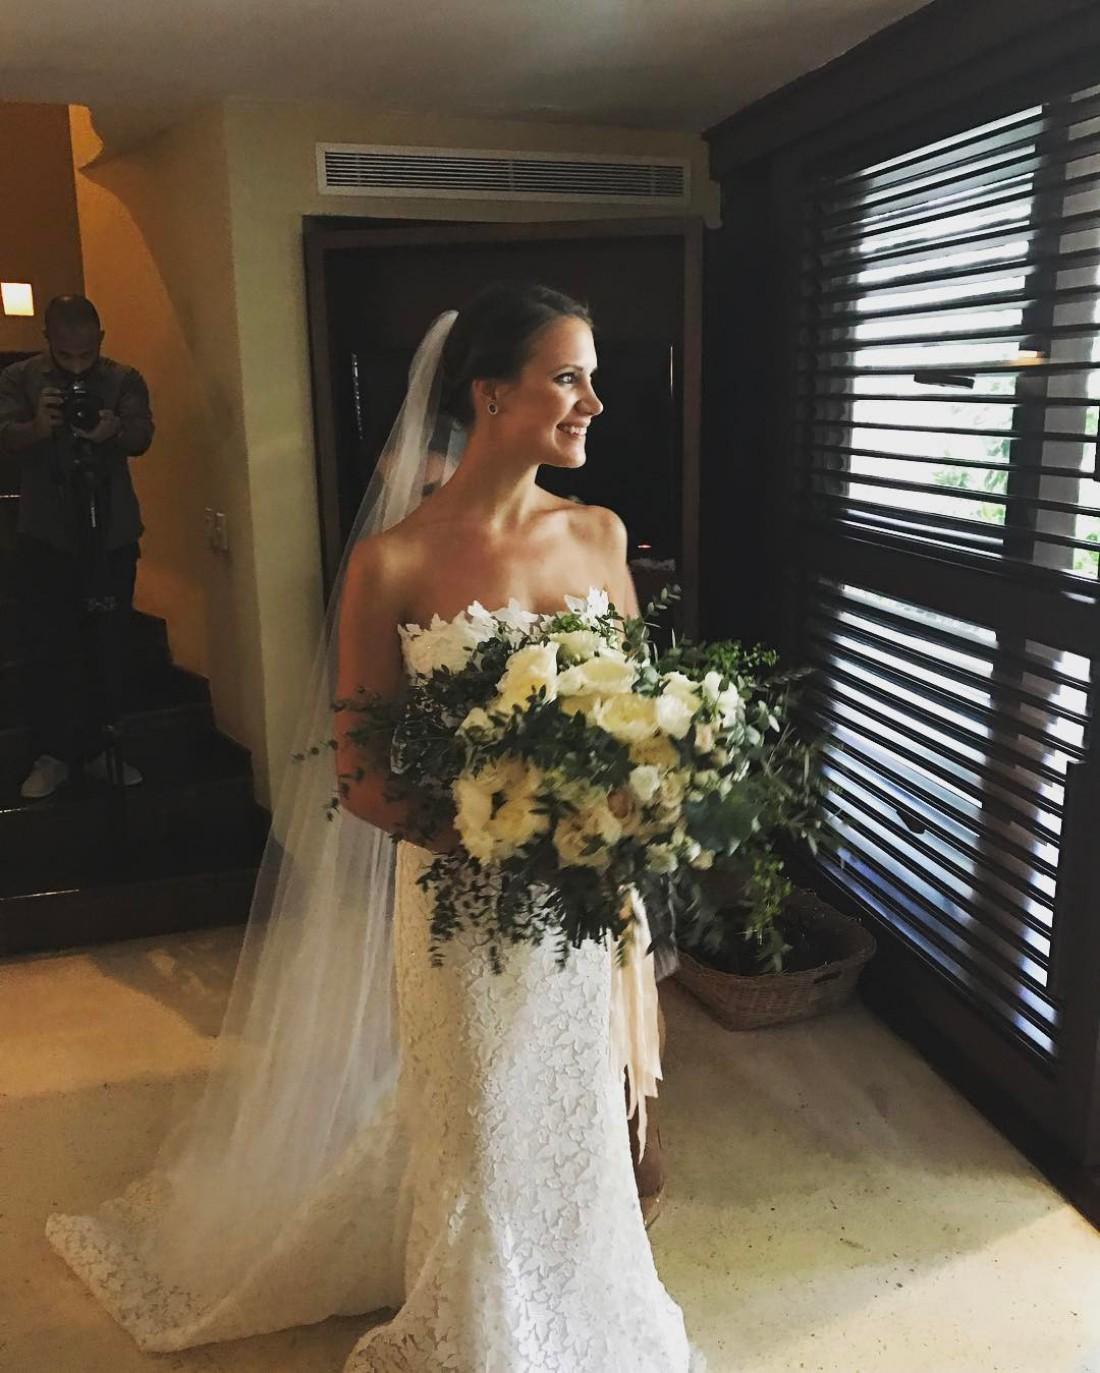 Кира Пластинина вышла замуж